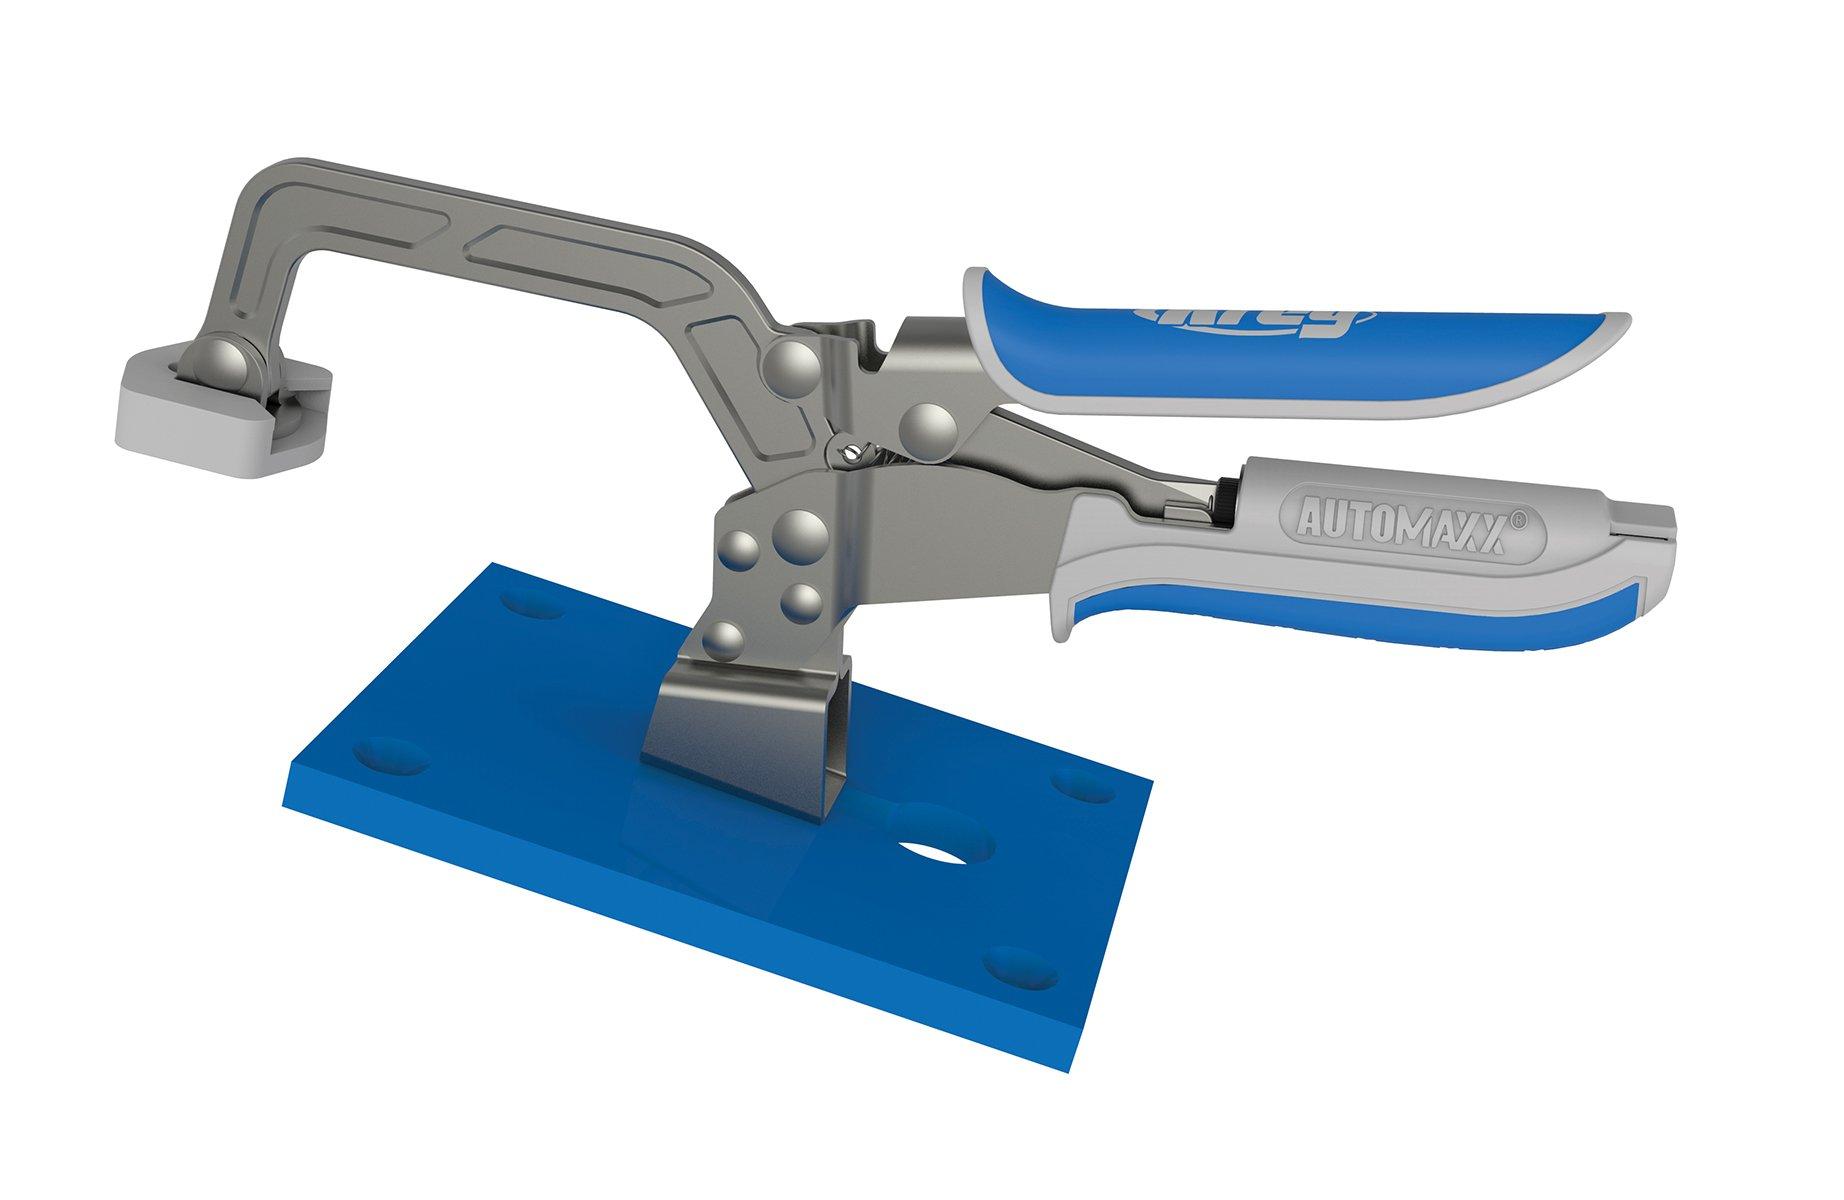 Kreg KBC3-SYS Bench Clamp System by KREG